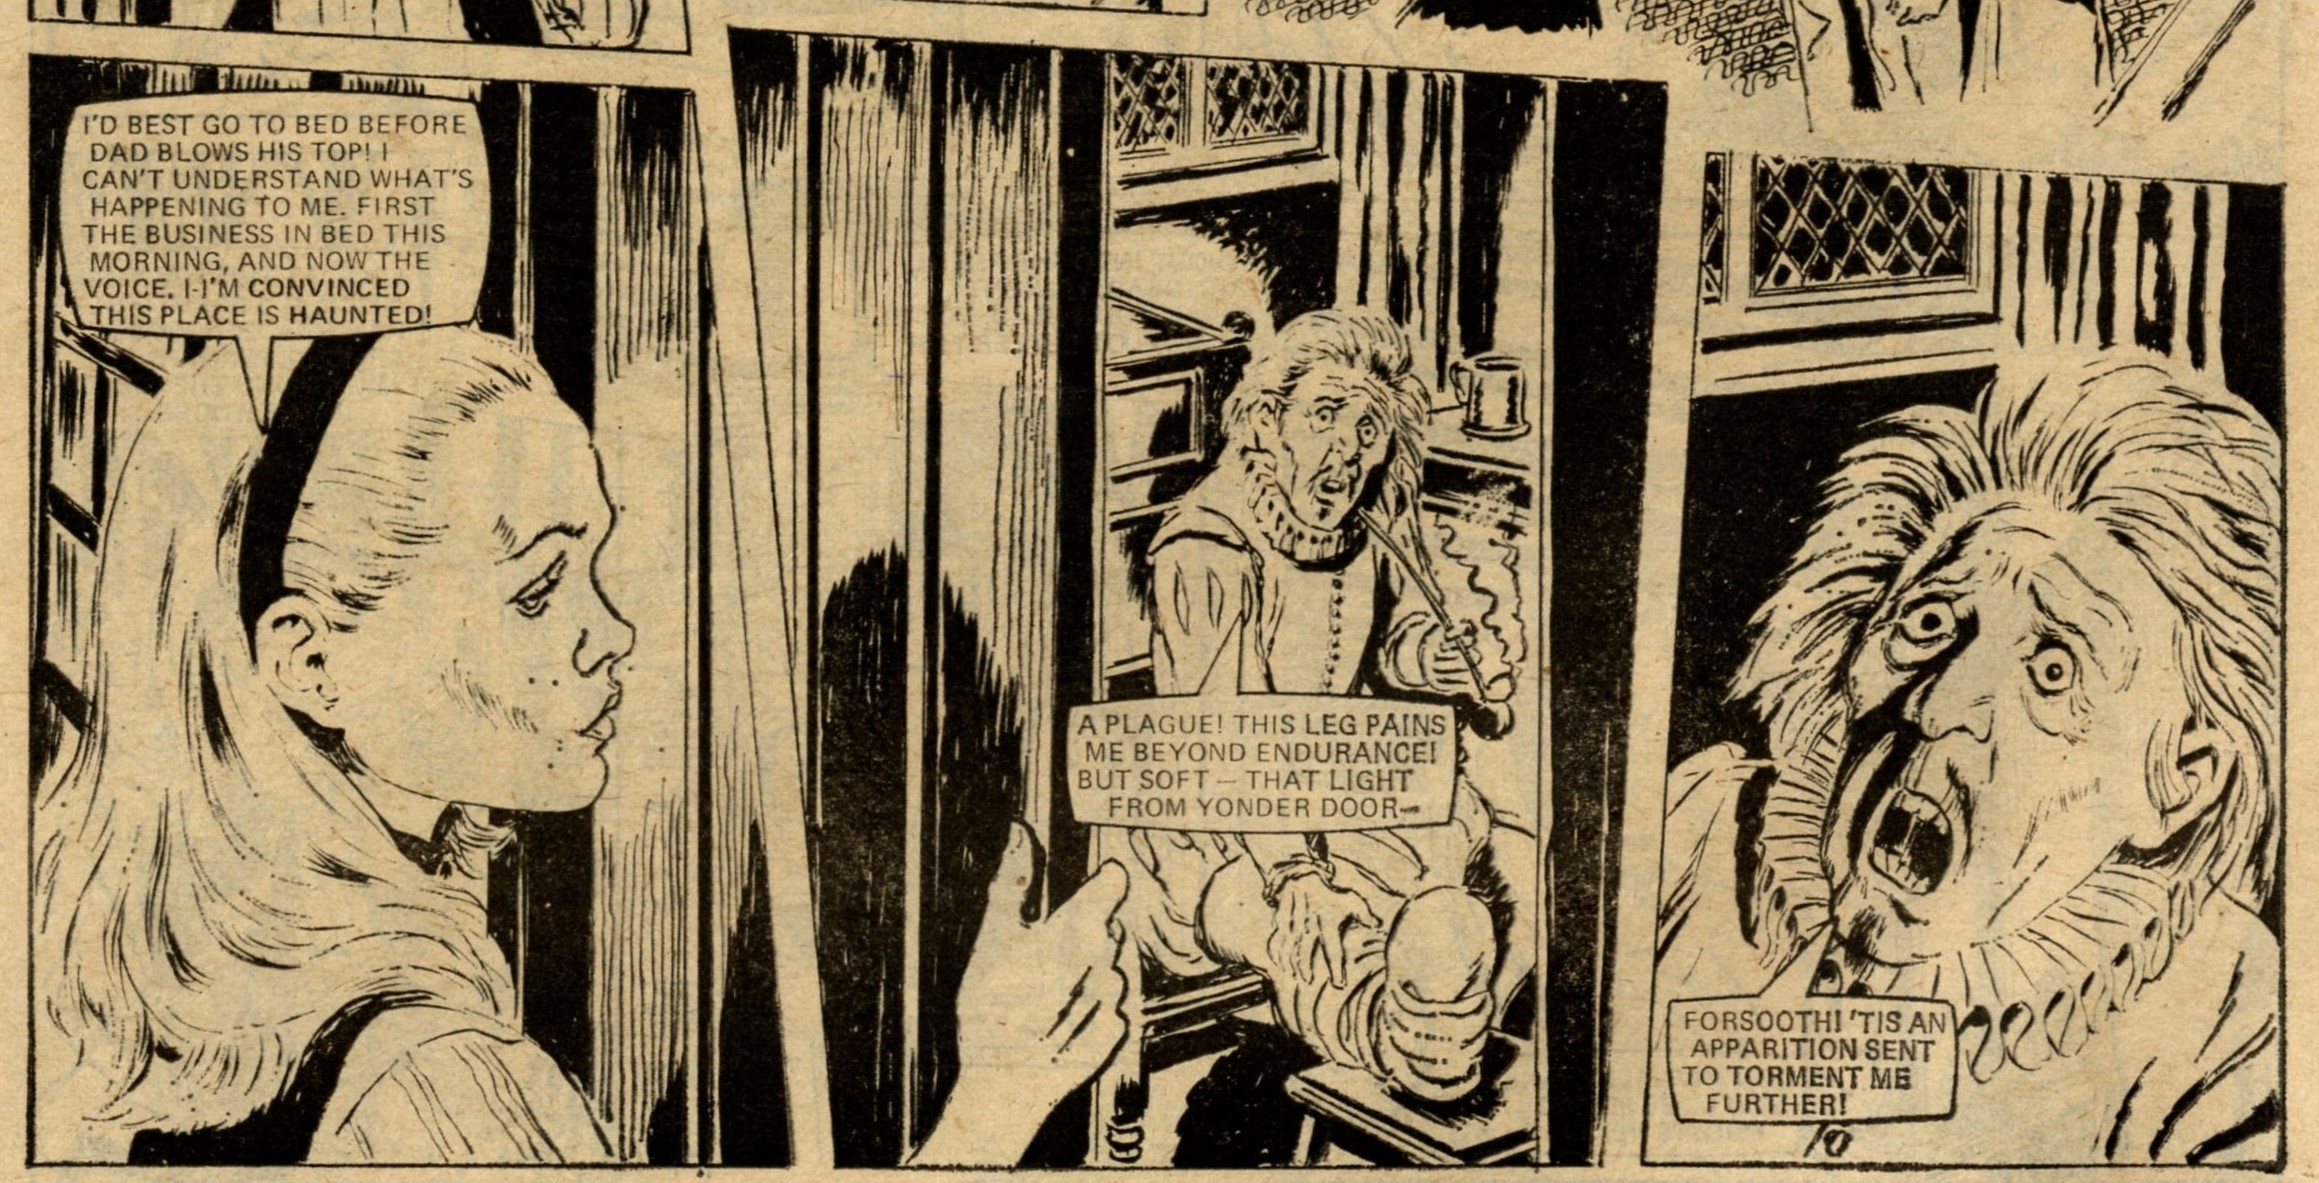 The Ghost Writer: John Armstrong (artist)